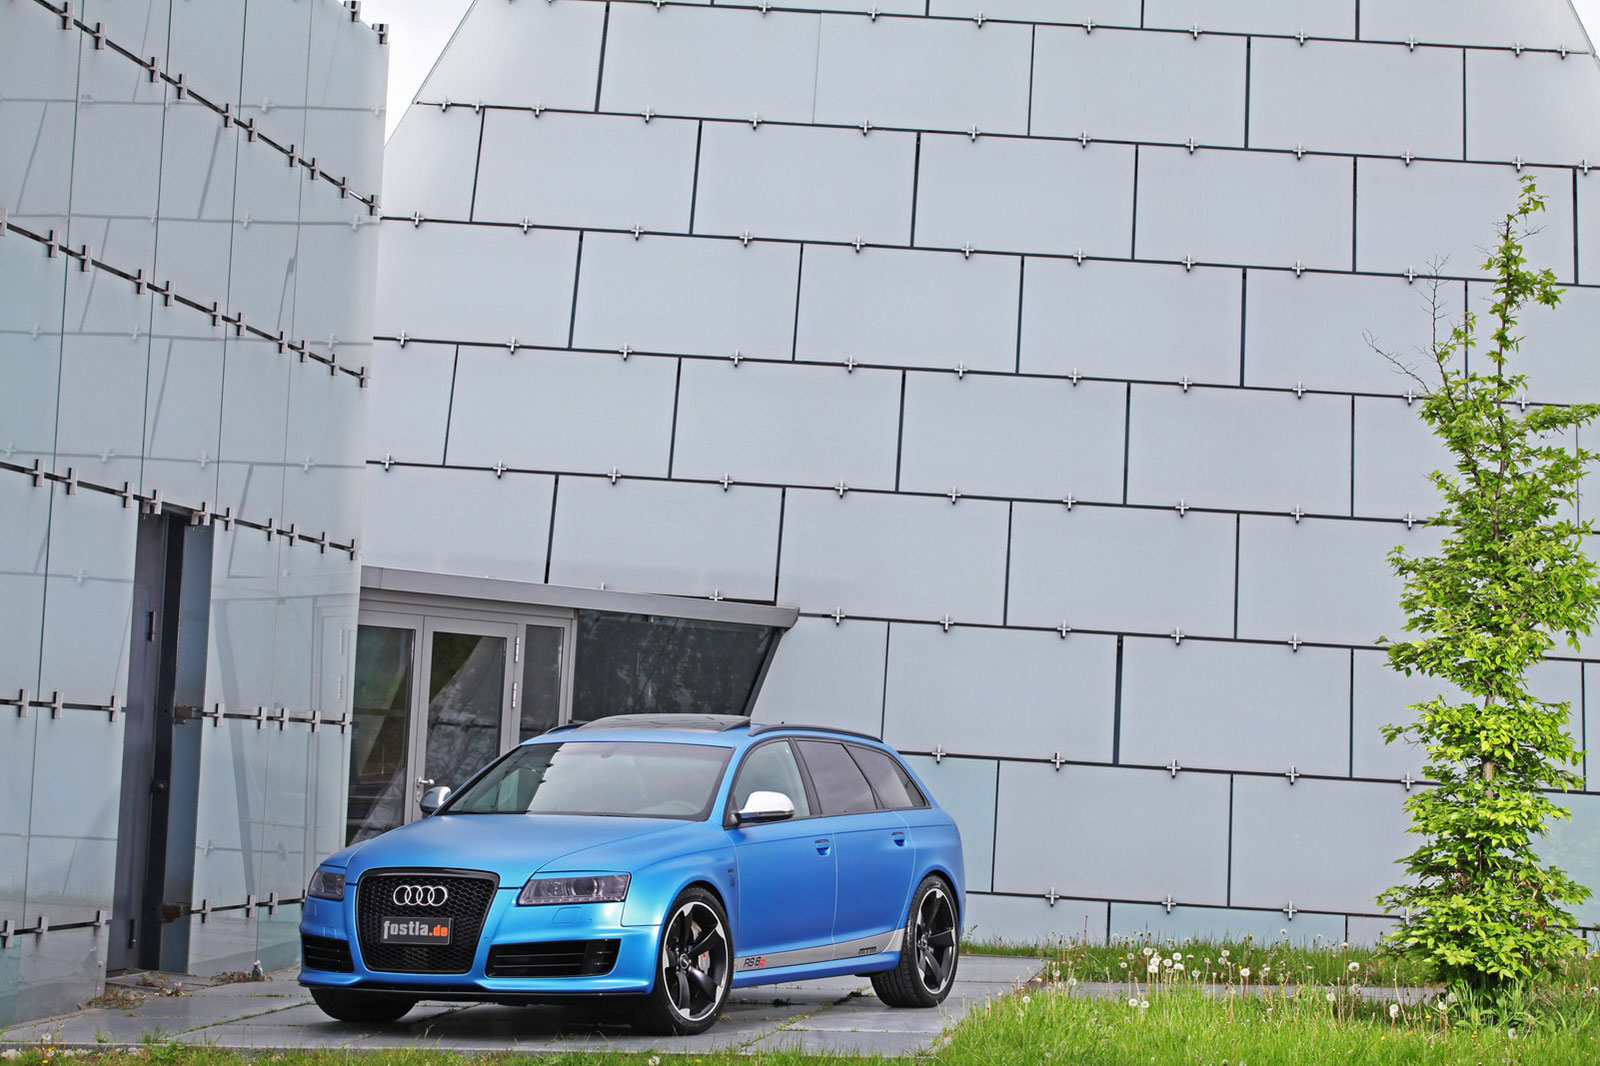 Fostla a MTM vytvořili velmi našlapané Audi RS6 Avant 9